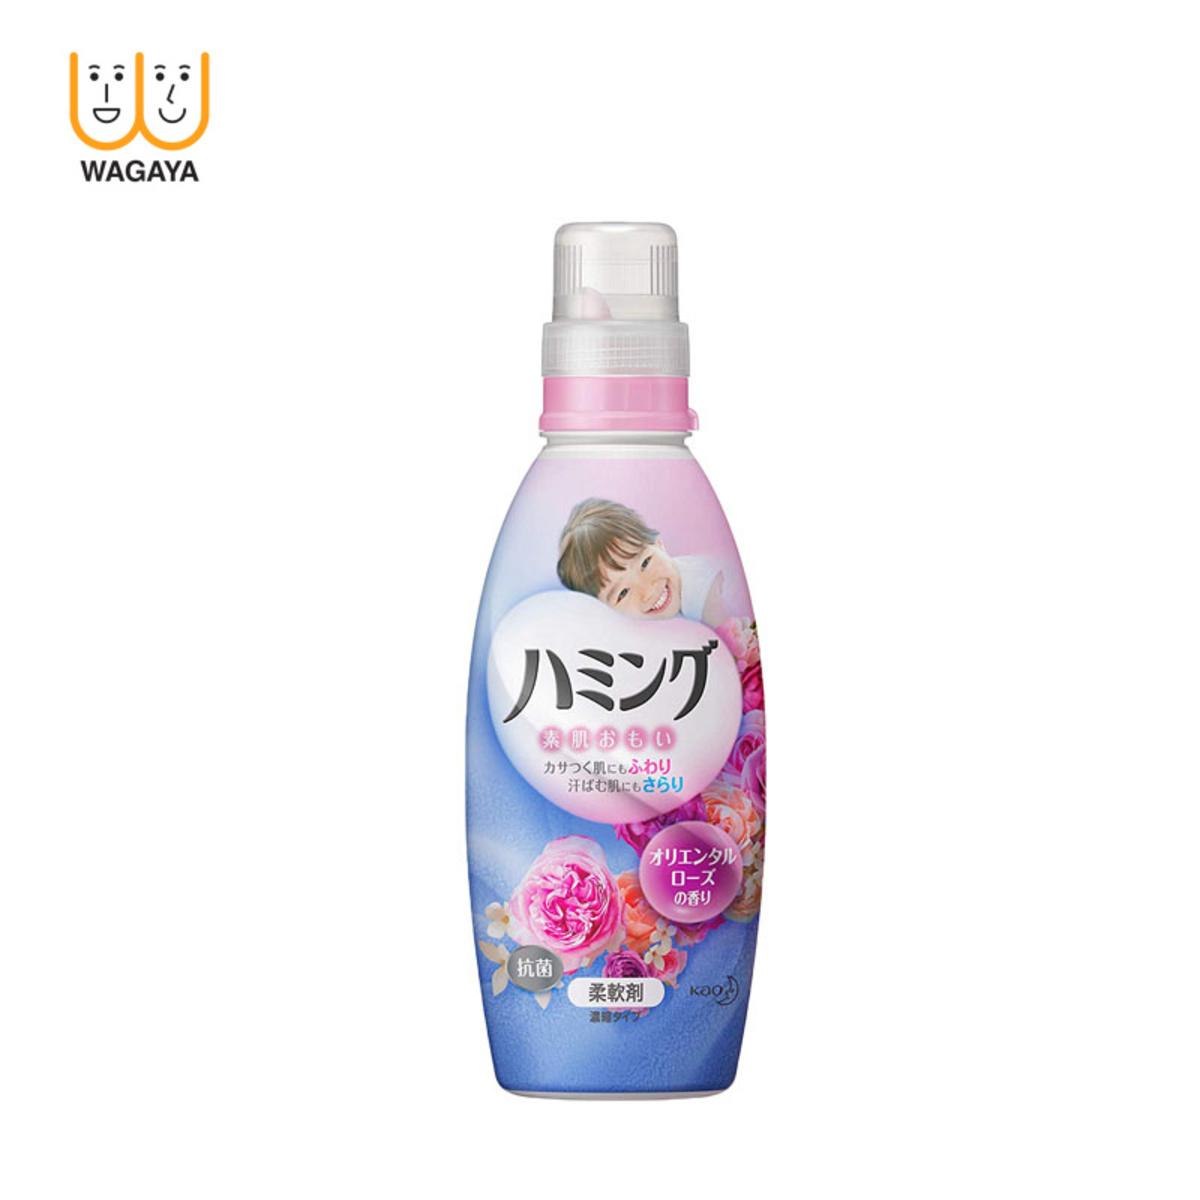 Humming Fragrance Fabric Softener 600ml (Oriental Rose - Pink)